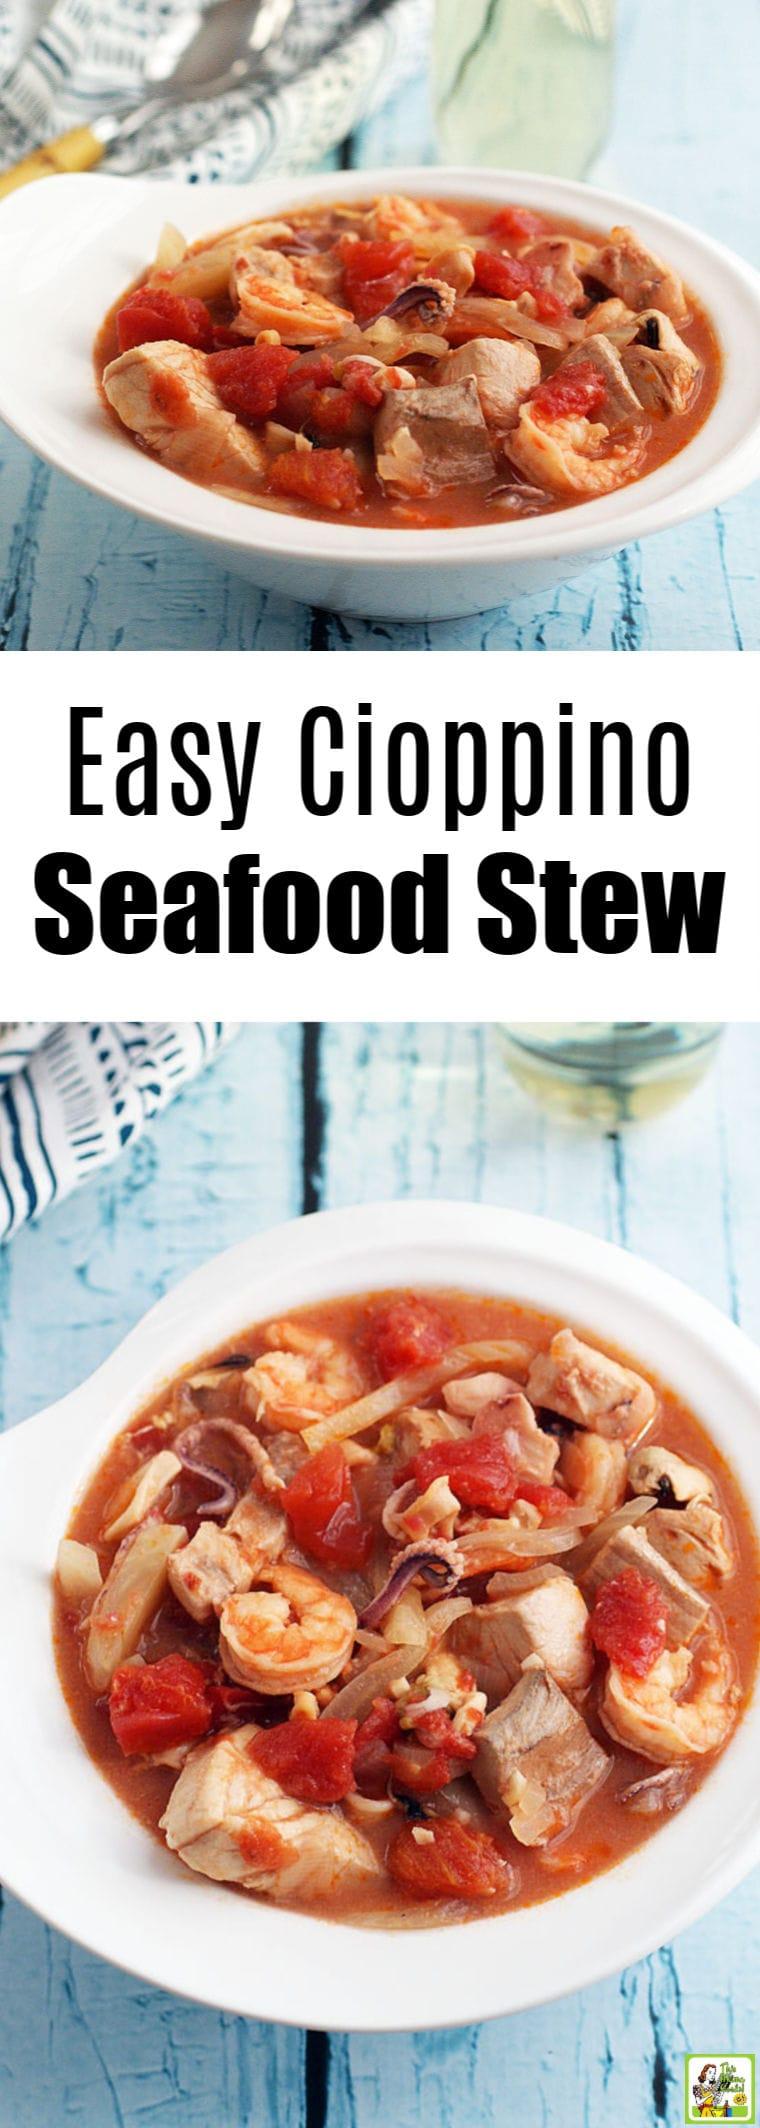 Easy Cioppino Seafood Stew Recipe